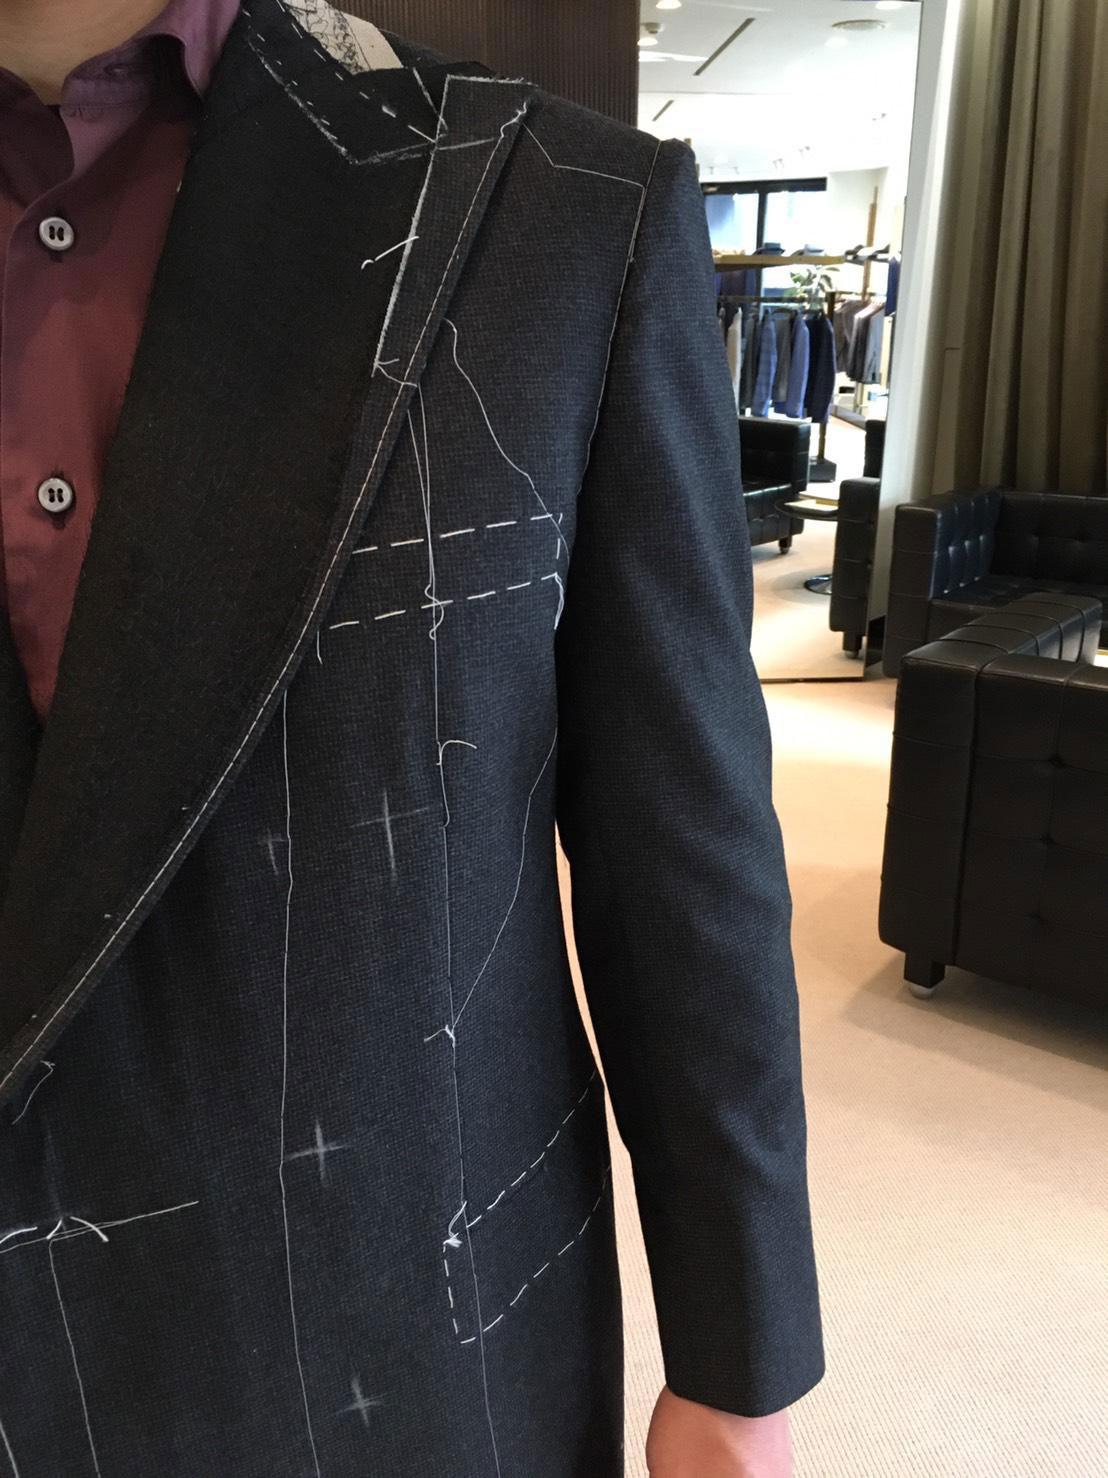 James Bond Blazer Brioni Measurements